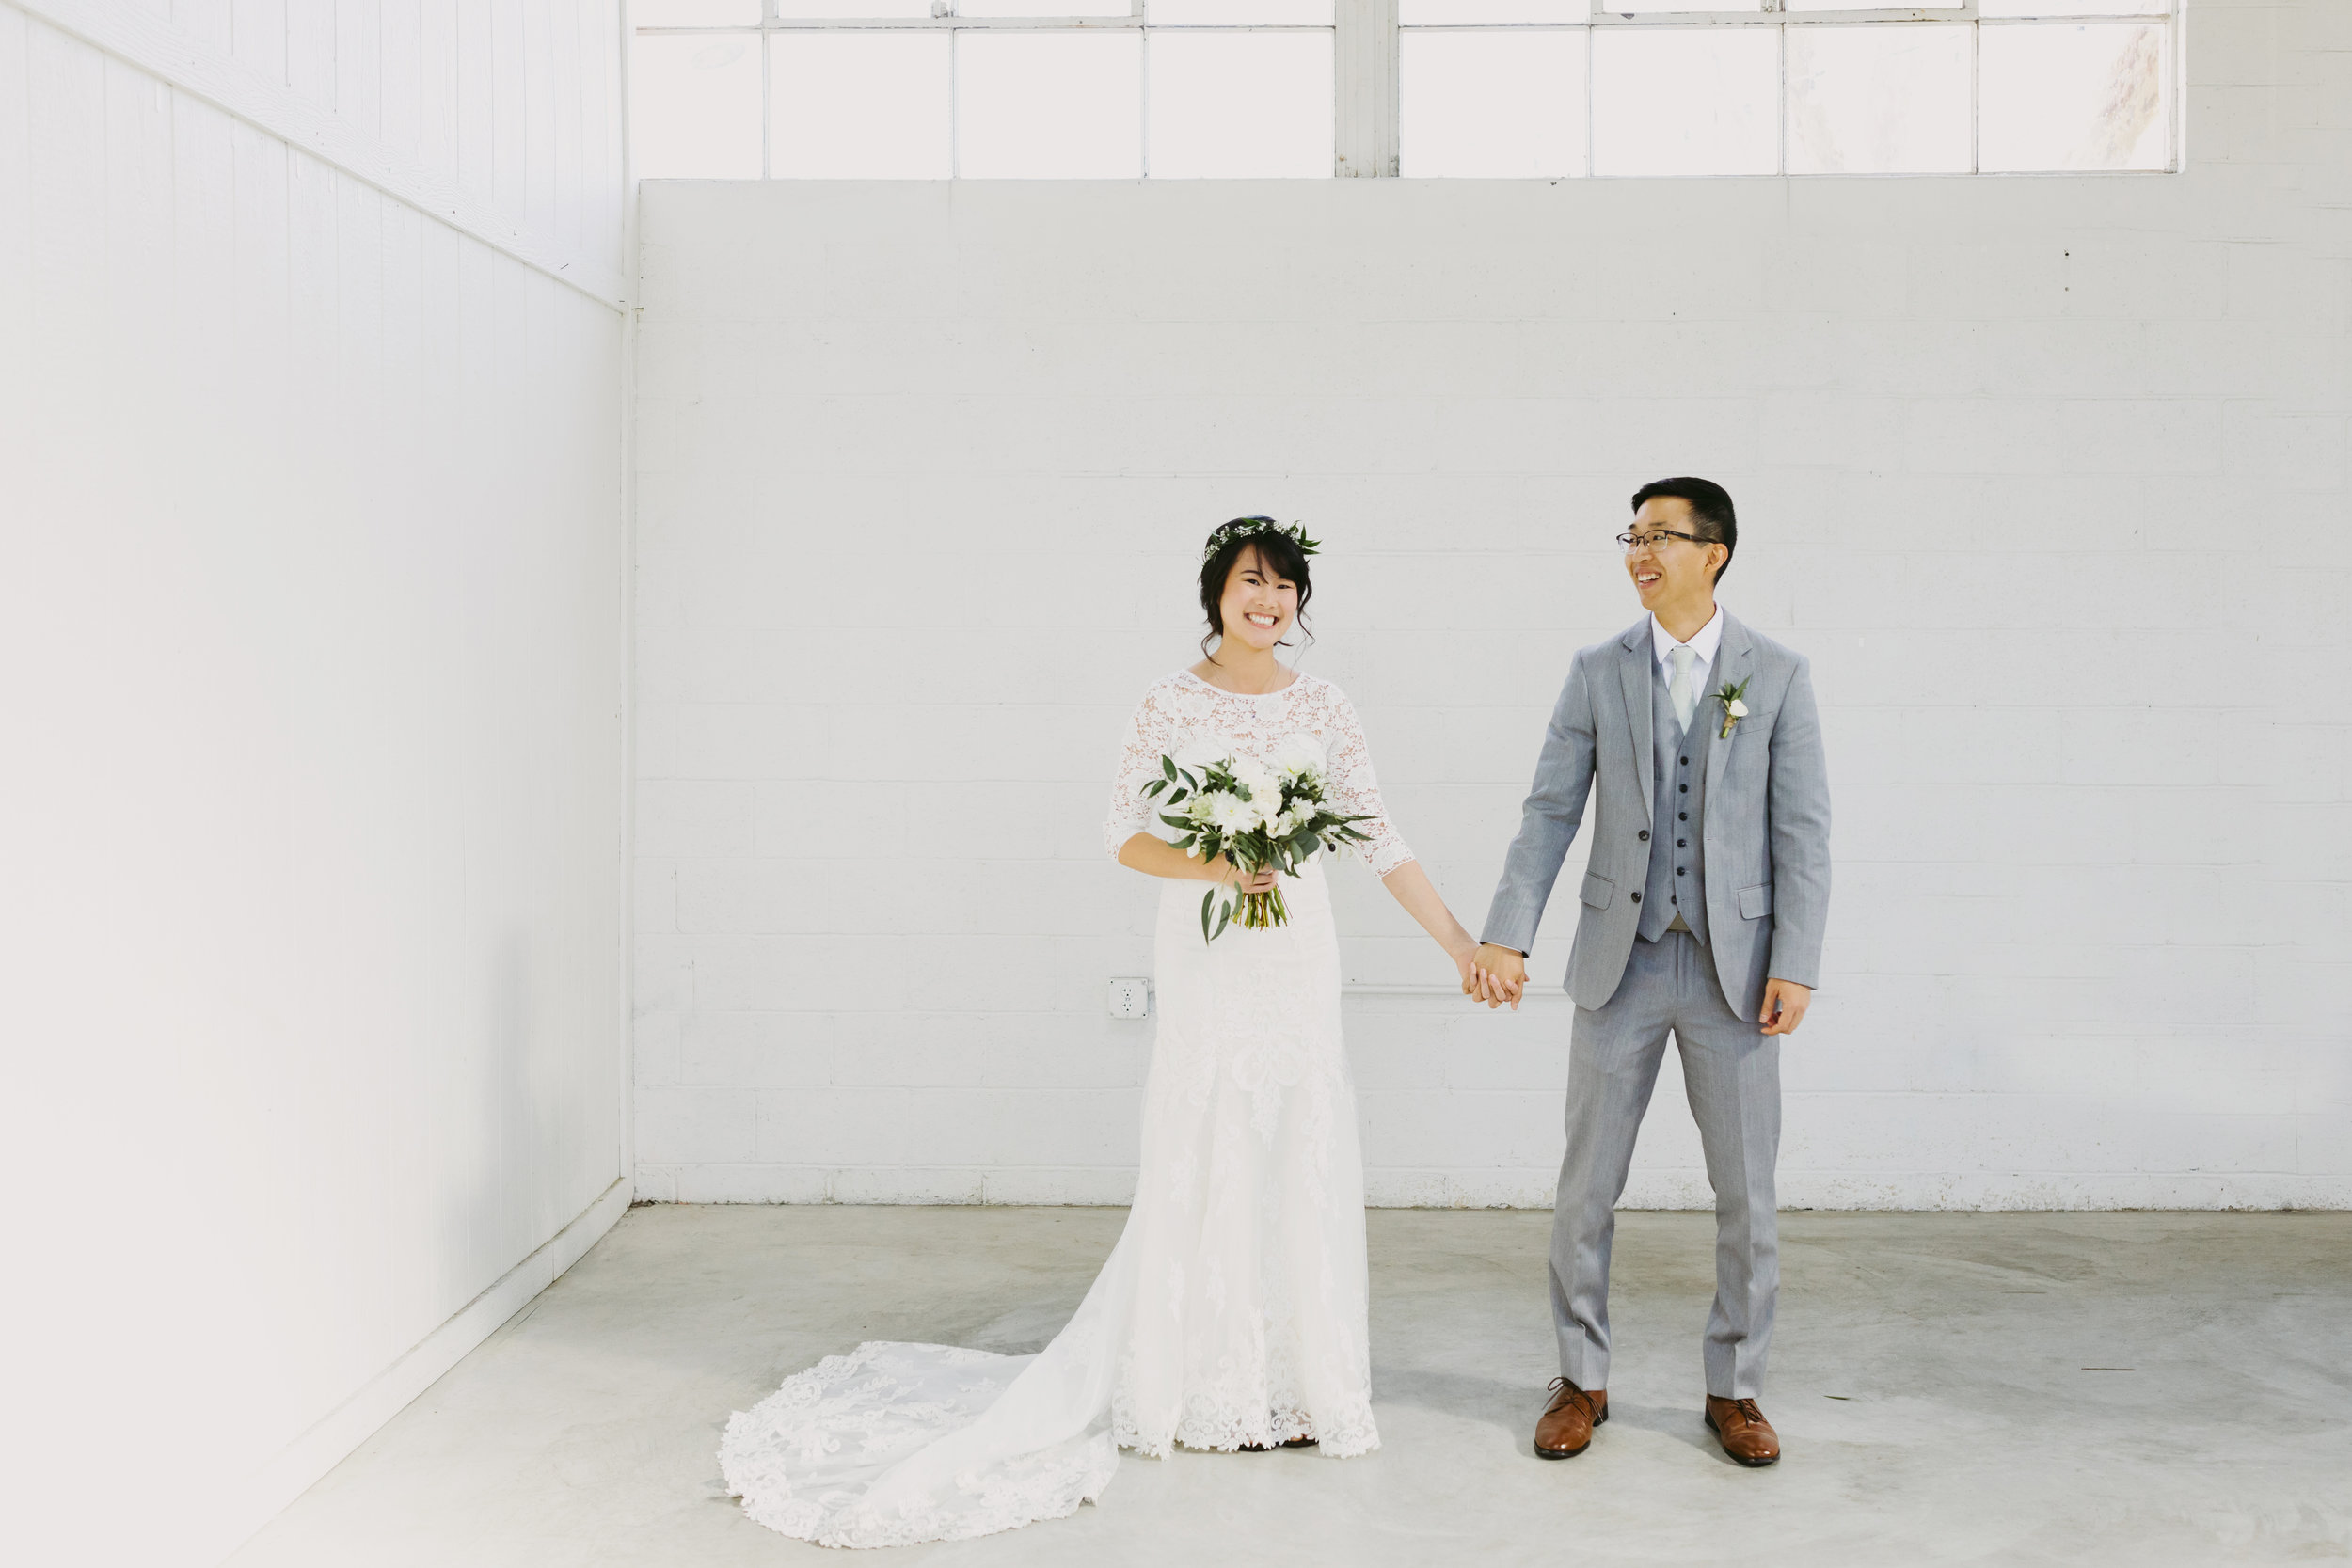 Our minimal, low-waste wedding -